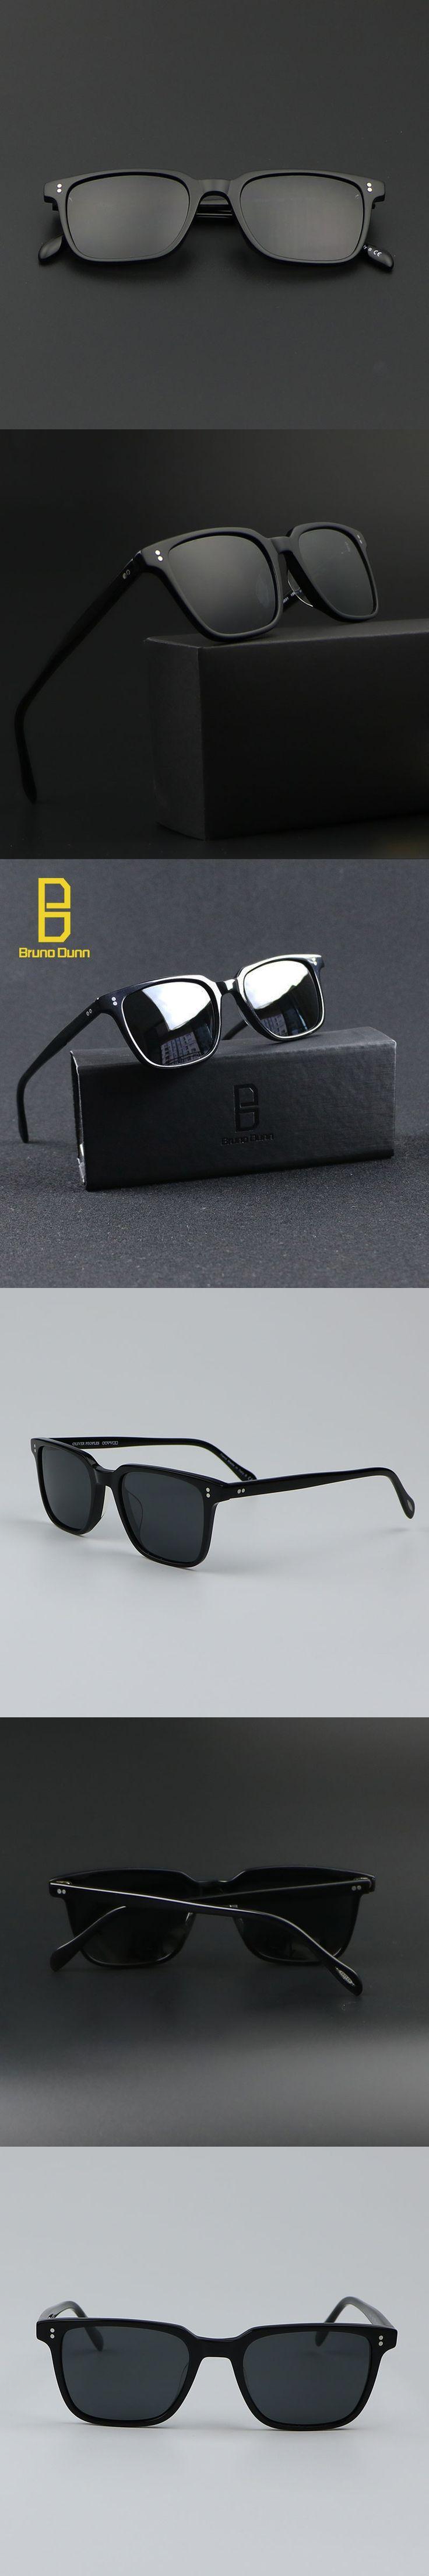 2016 New Oliver Polarized Brand Designer Sunglasses Men Women Vintage Sun Glasses Eyewear Gafas Oculos De Sol Feminino 2140